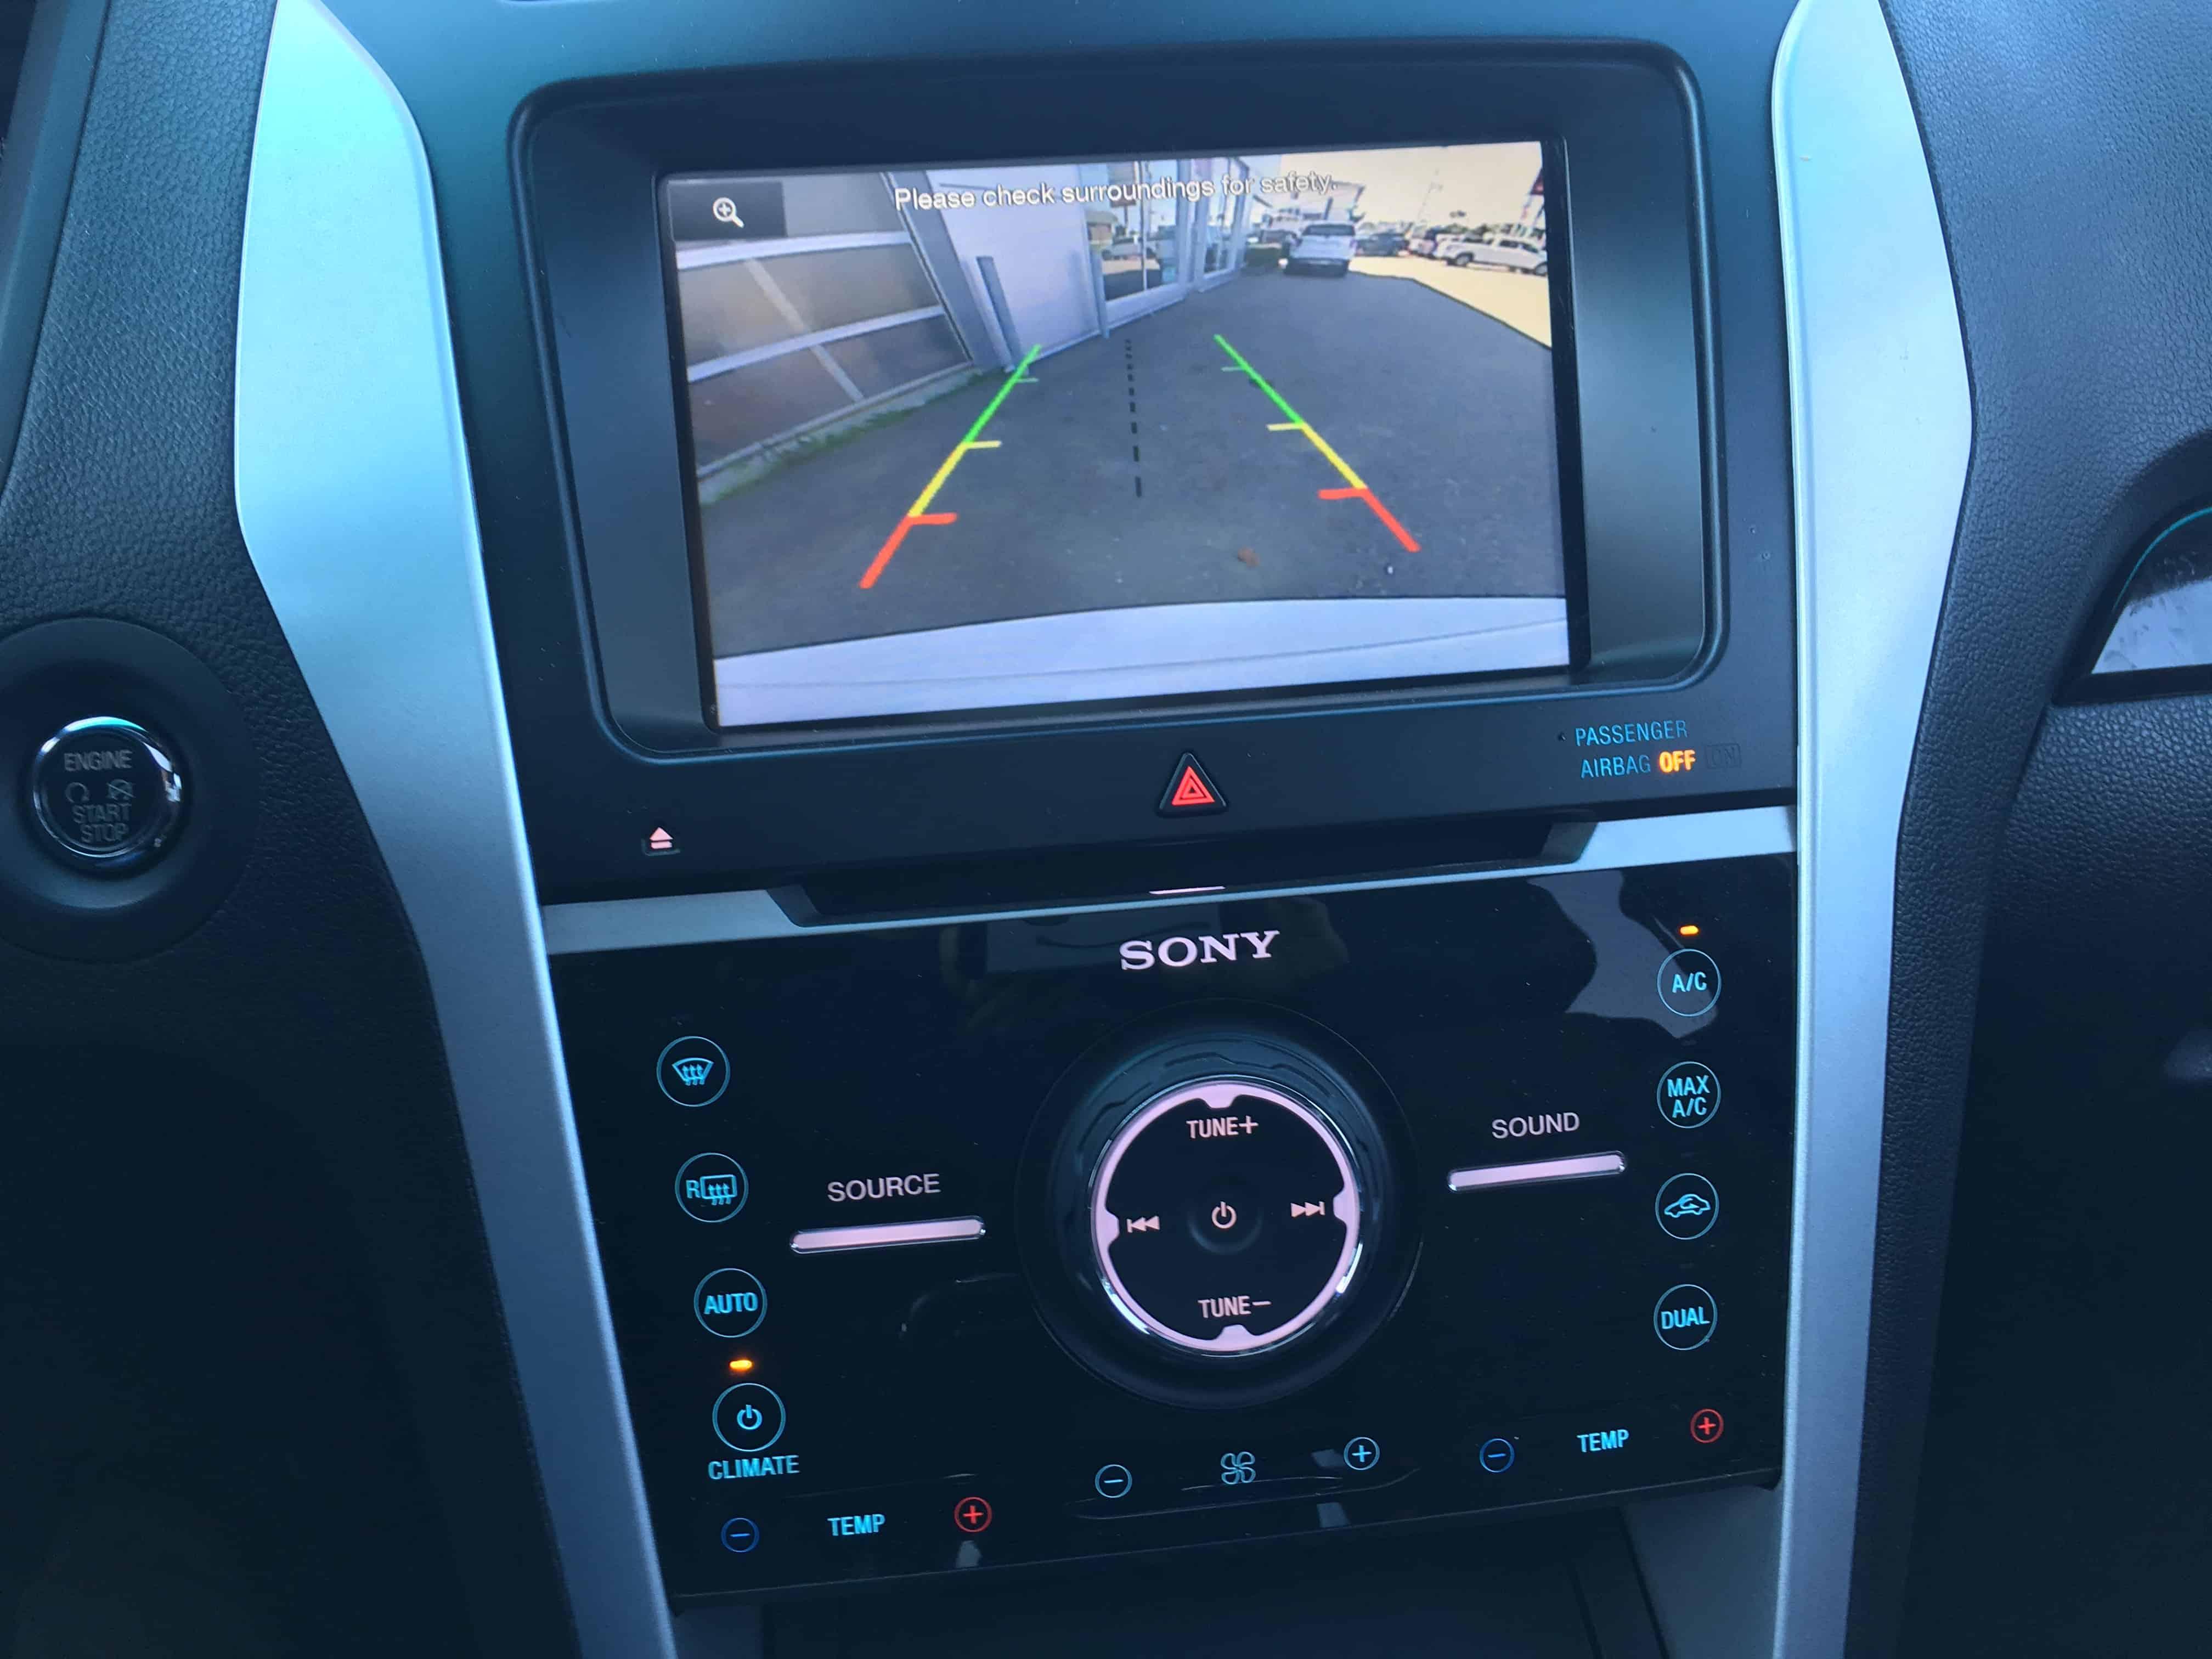 Ford Explorer Ltd Awd Navigation Reverse Camera Remote Start Kia Problems 30987